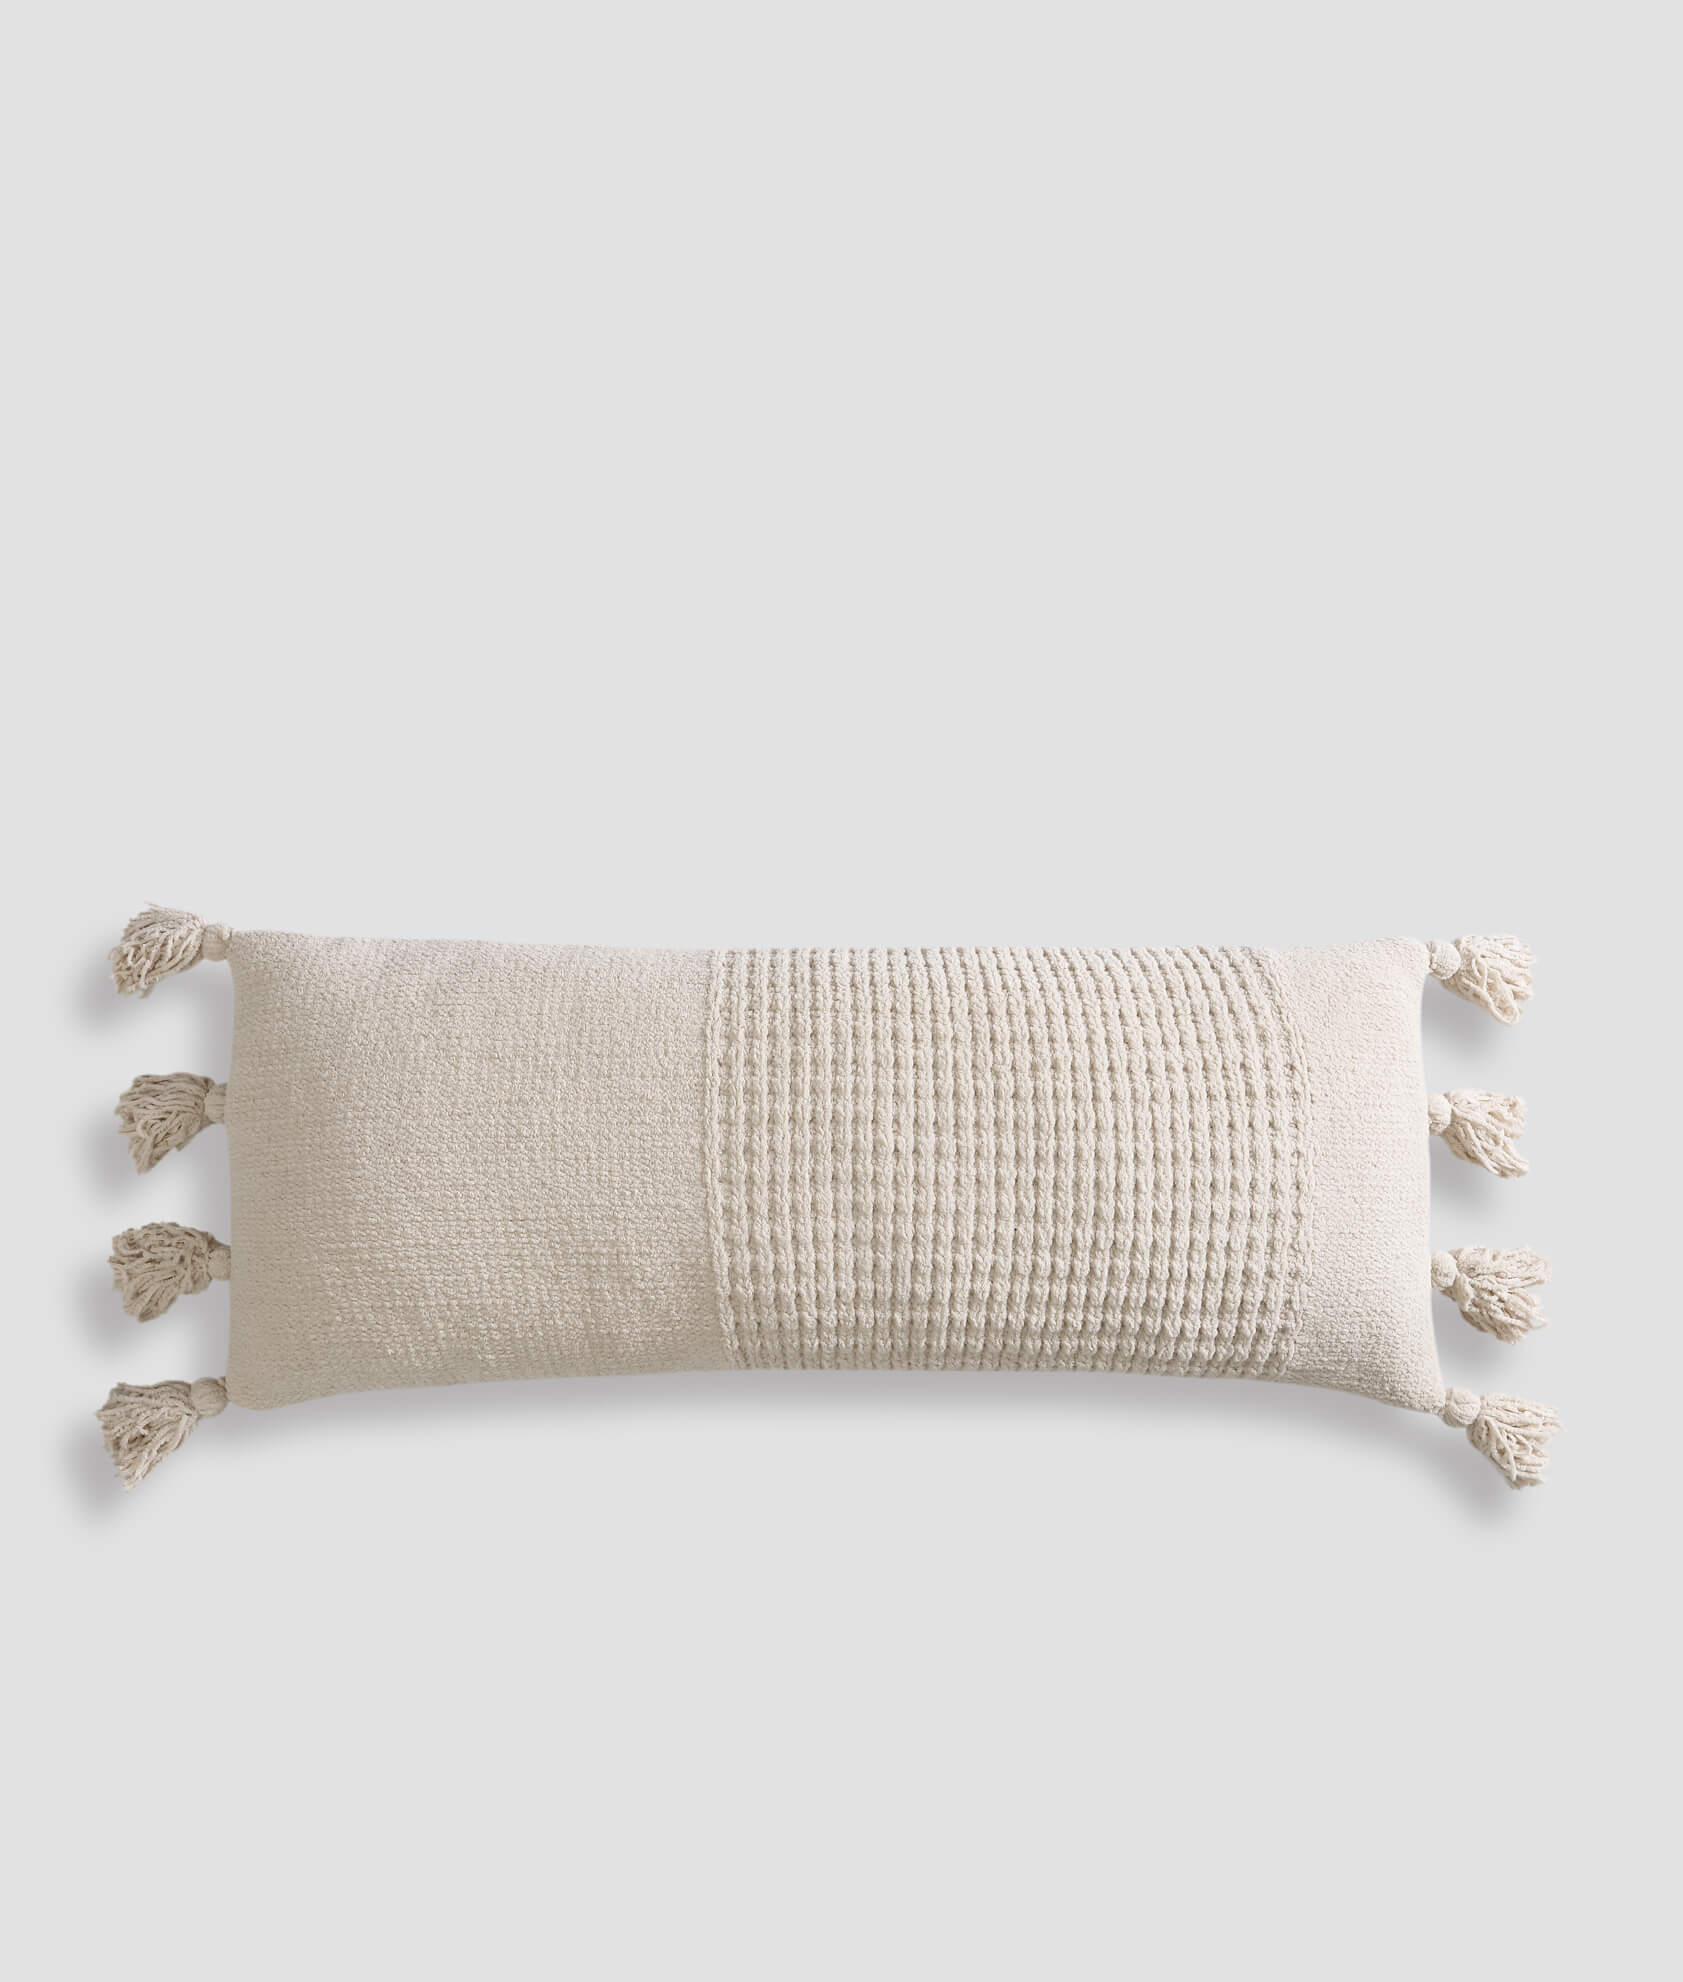 Braided Pom Pom Lumbar Pillow